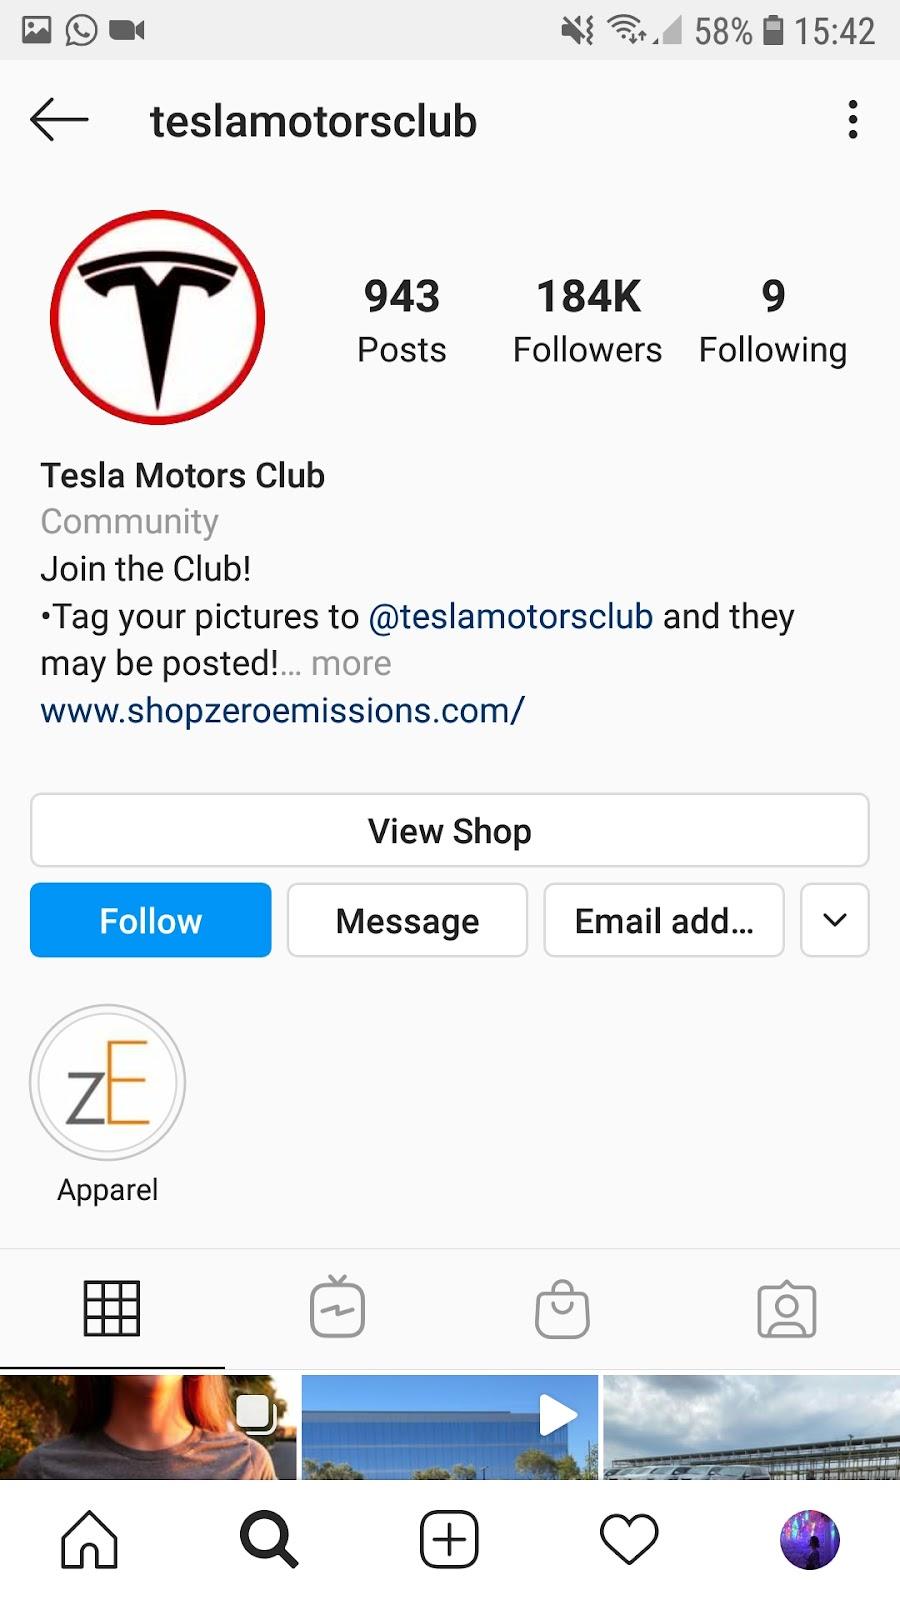 tesla motors club instagram